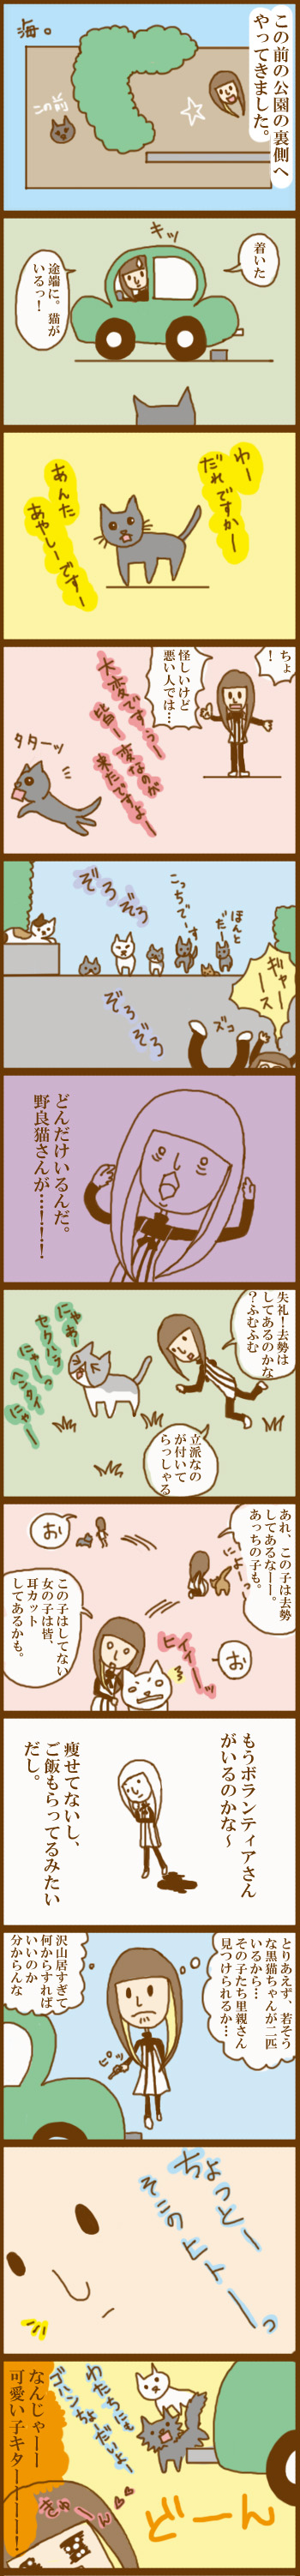 f:id:suzuokayu:20201017224746j:plain